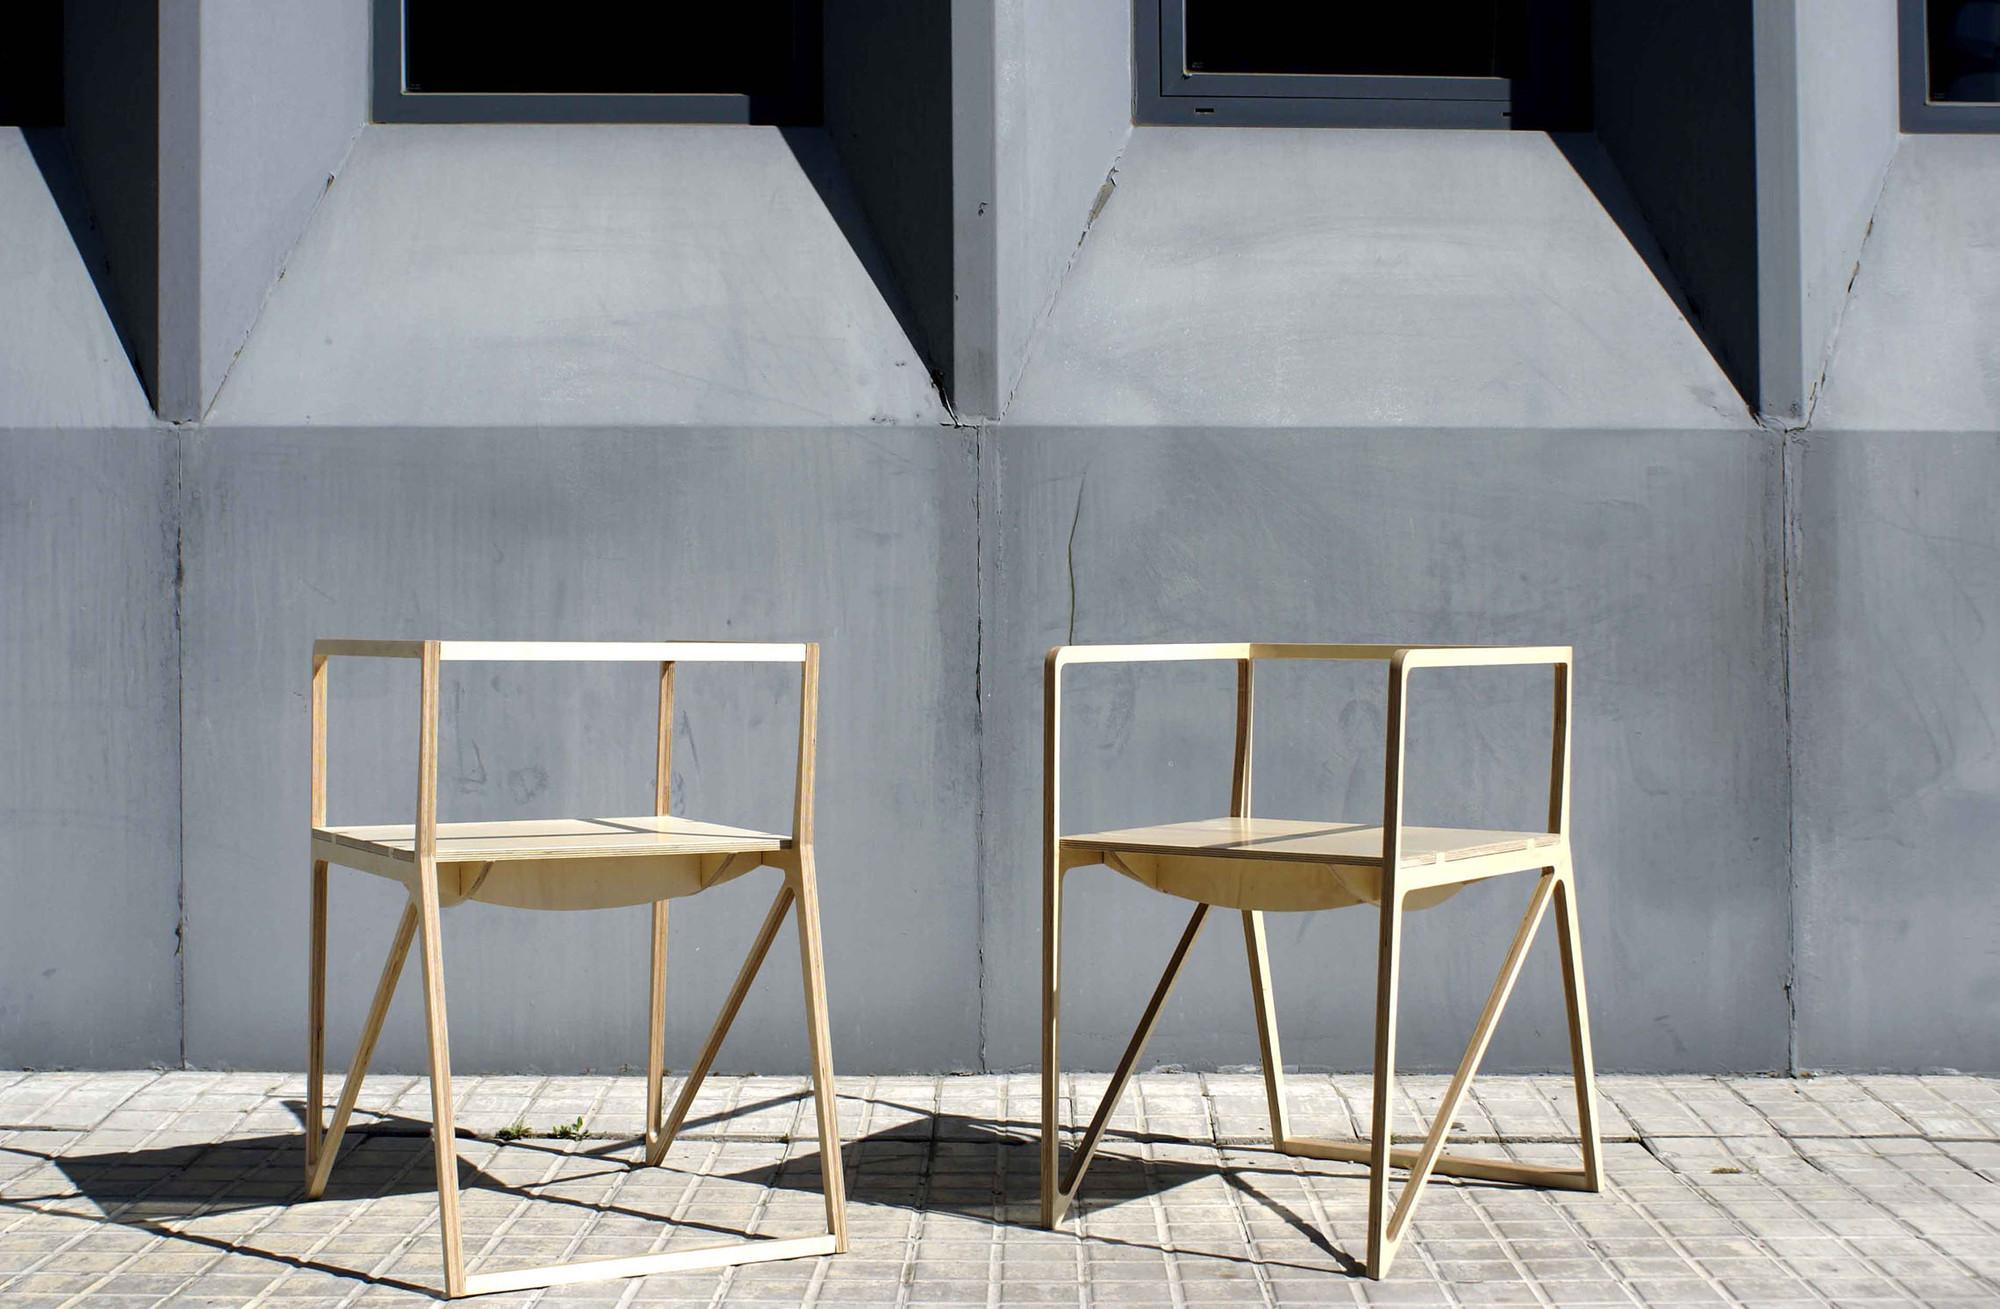 Silla Brace / Ignacio Hornillos Design Studio, Courtesy of Ignacio Hornillos